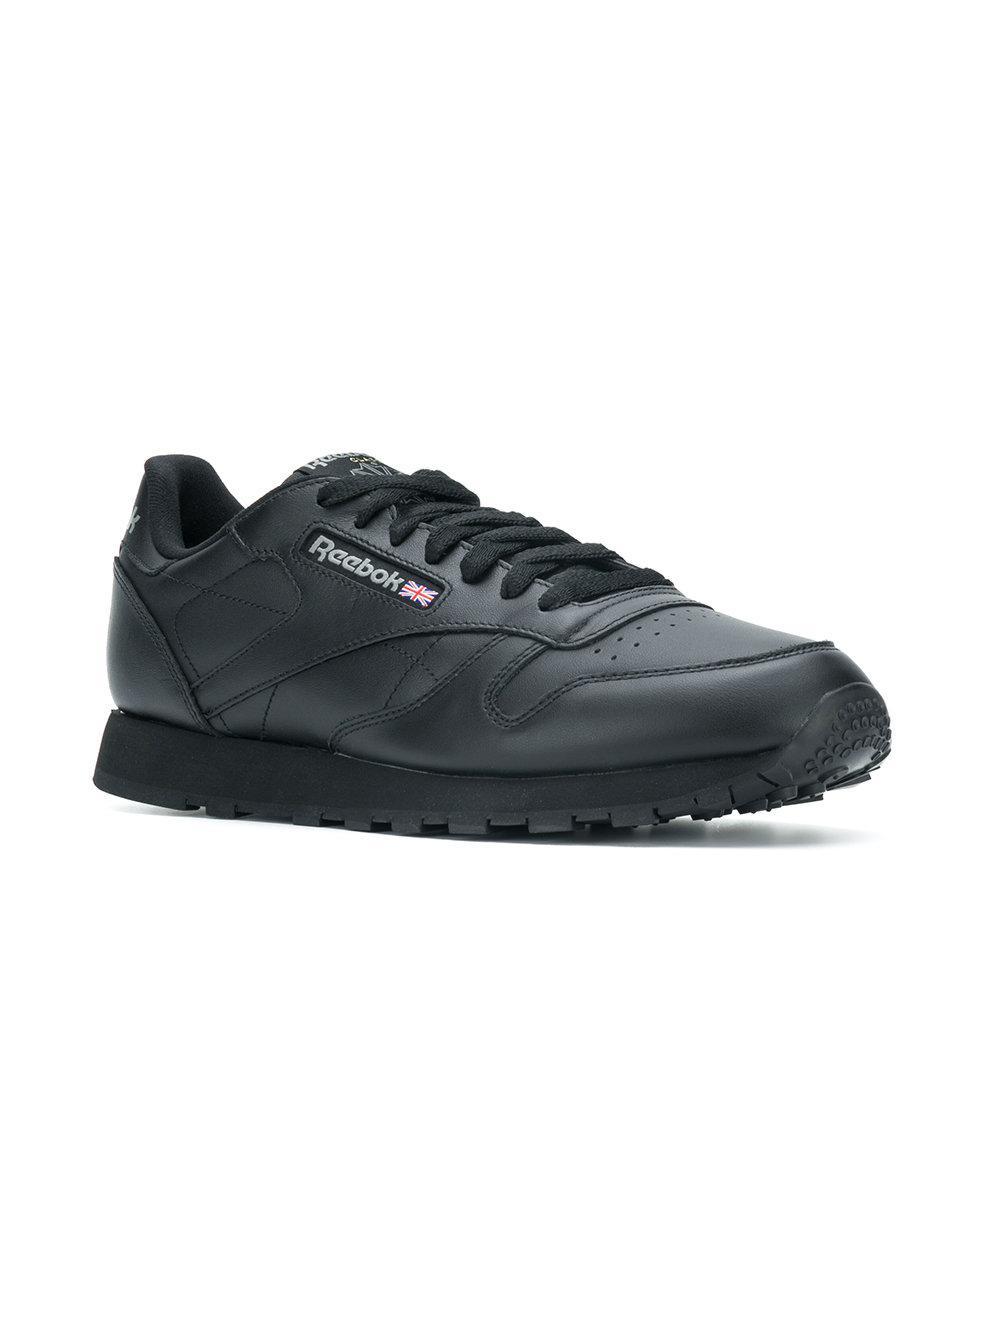 Reebok Cotton Low Top Sneakers in Black for Men